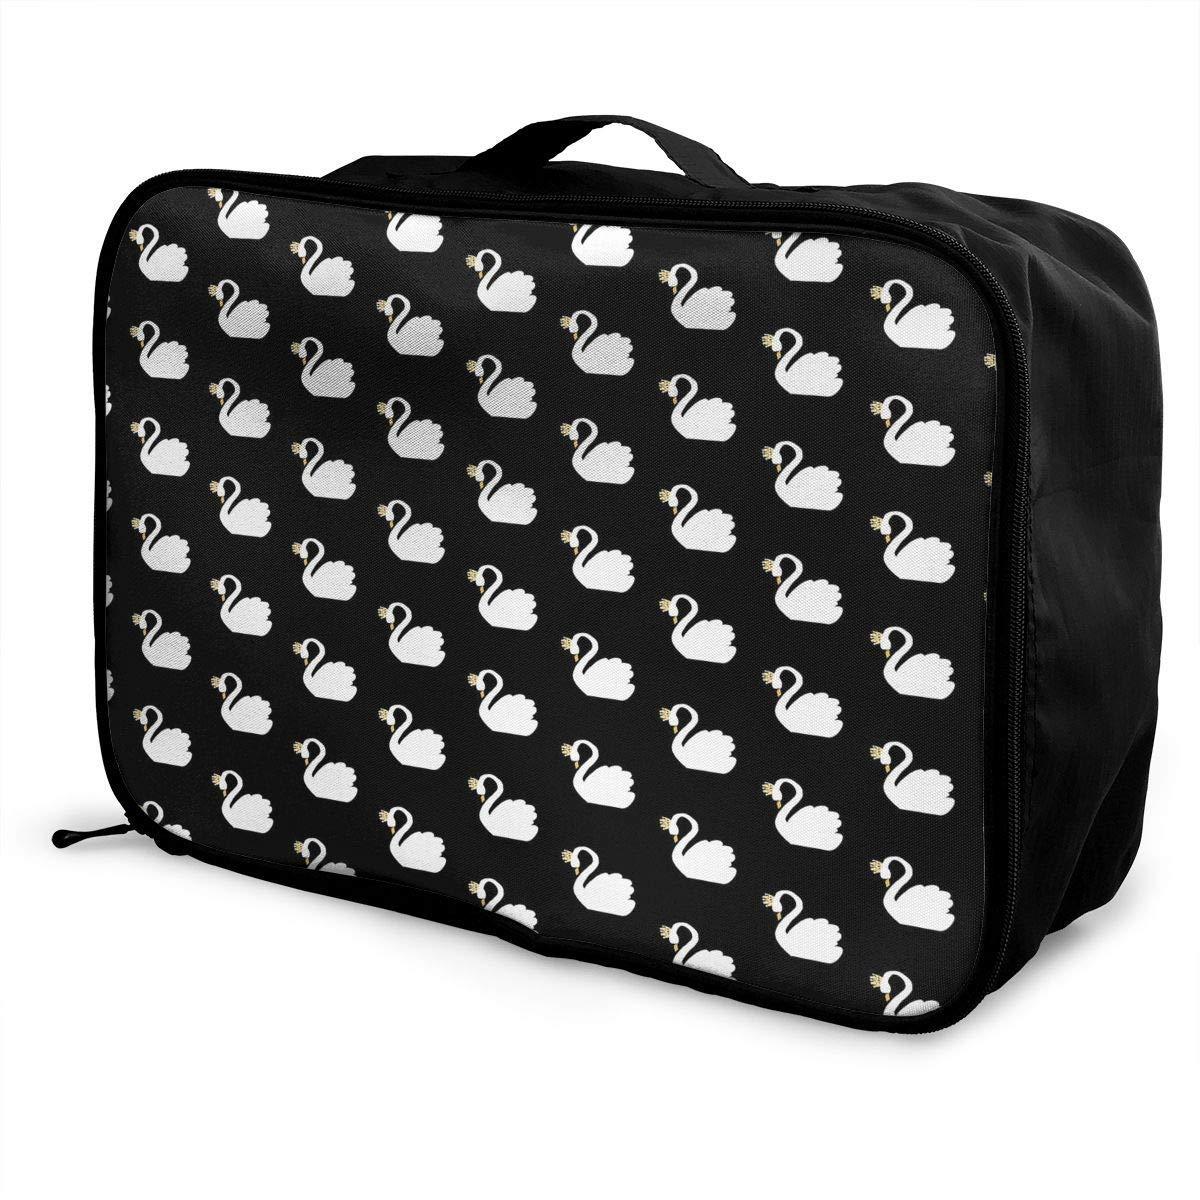 Travel Duffel Bag Waterproof Fashion Lightweight Large Capacity Portable Duffel Bag for Men /& Women JTRVW Luggage Bags for Travel White Swan Black